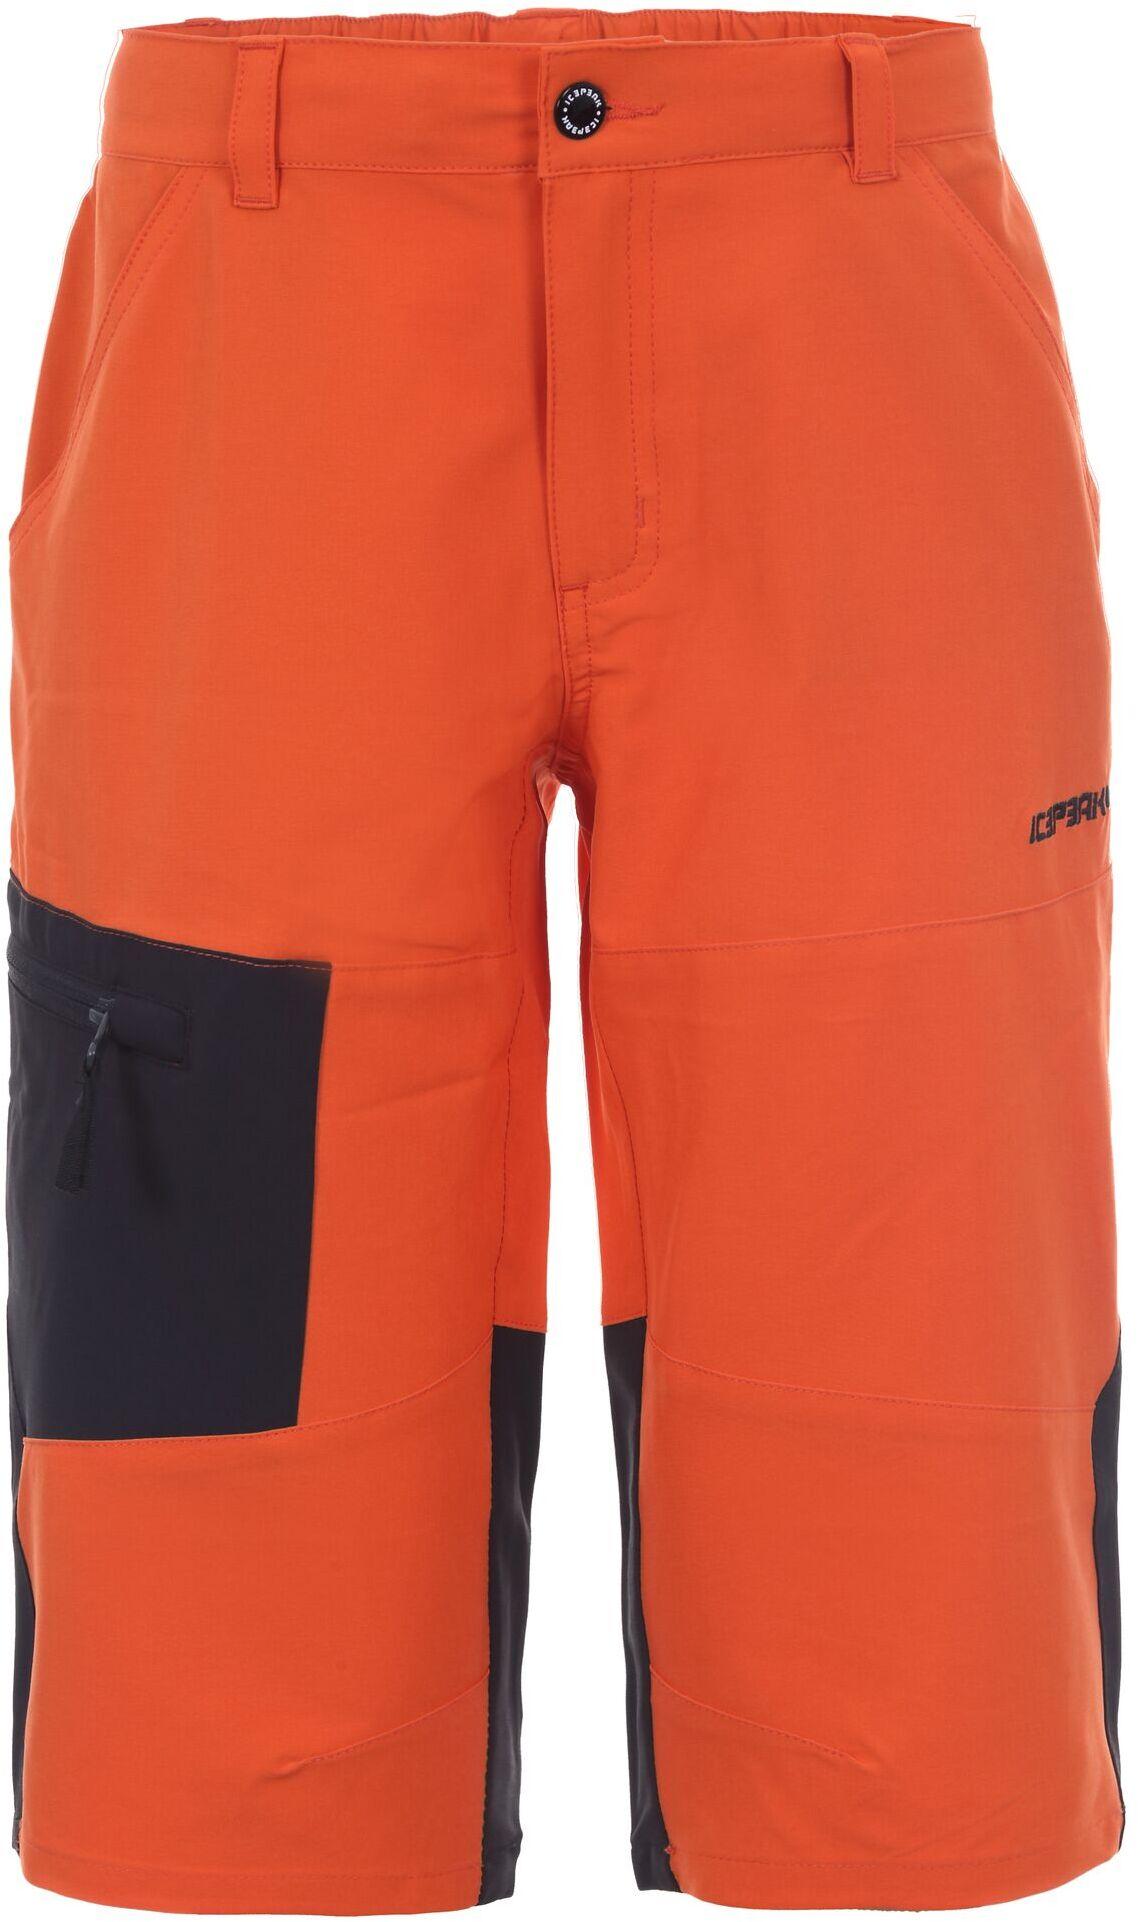 Шорты Для Активного Отдыха Icepeak 2020 Kobe Jr Burned Orange Рост:176